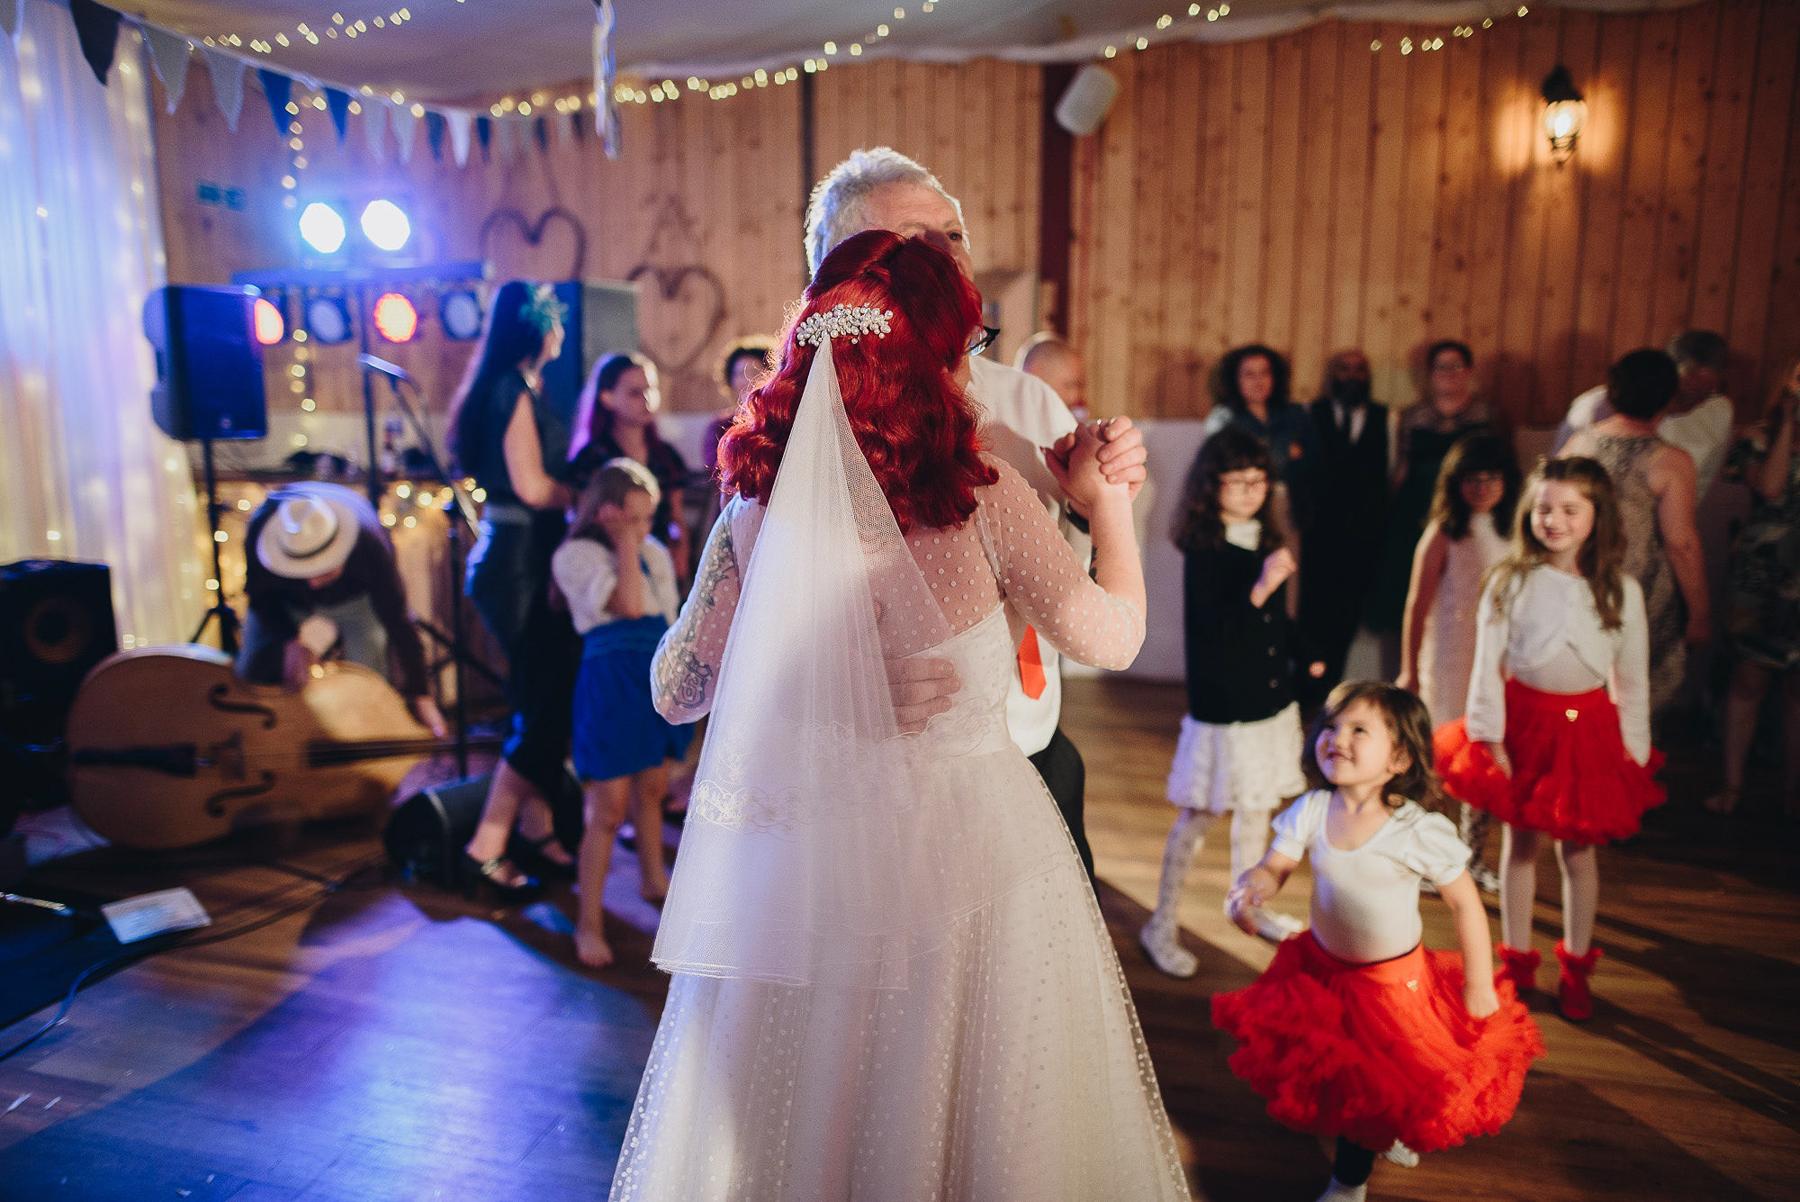 Wellbeing_Farm_Wedding_Photography_The_Pin-Up_Bride_Lara_Shaun-148.jpg